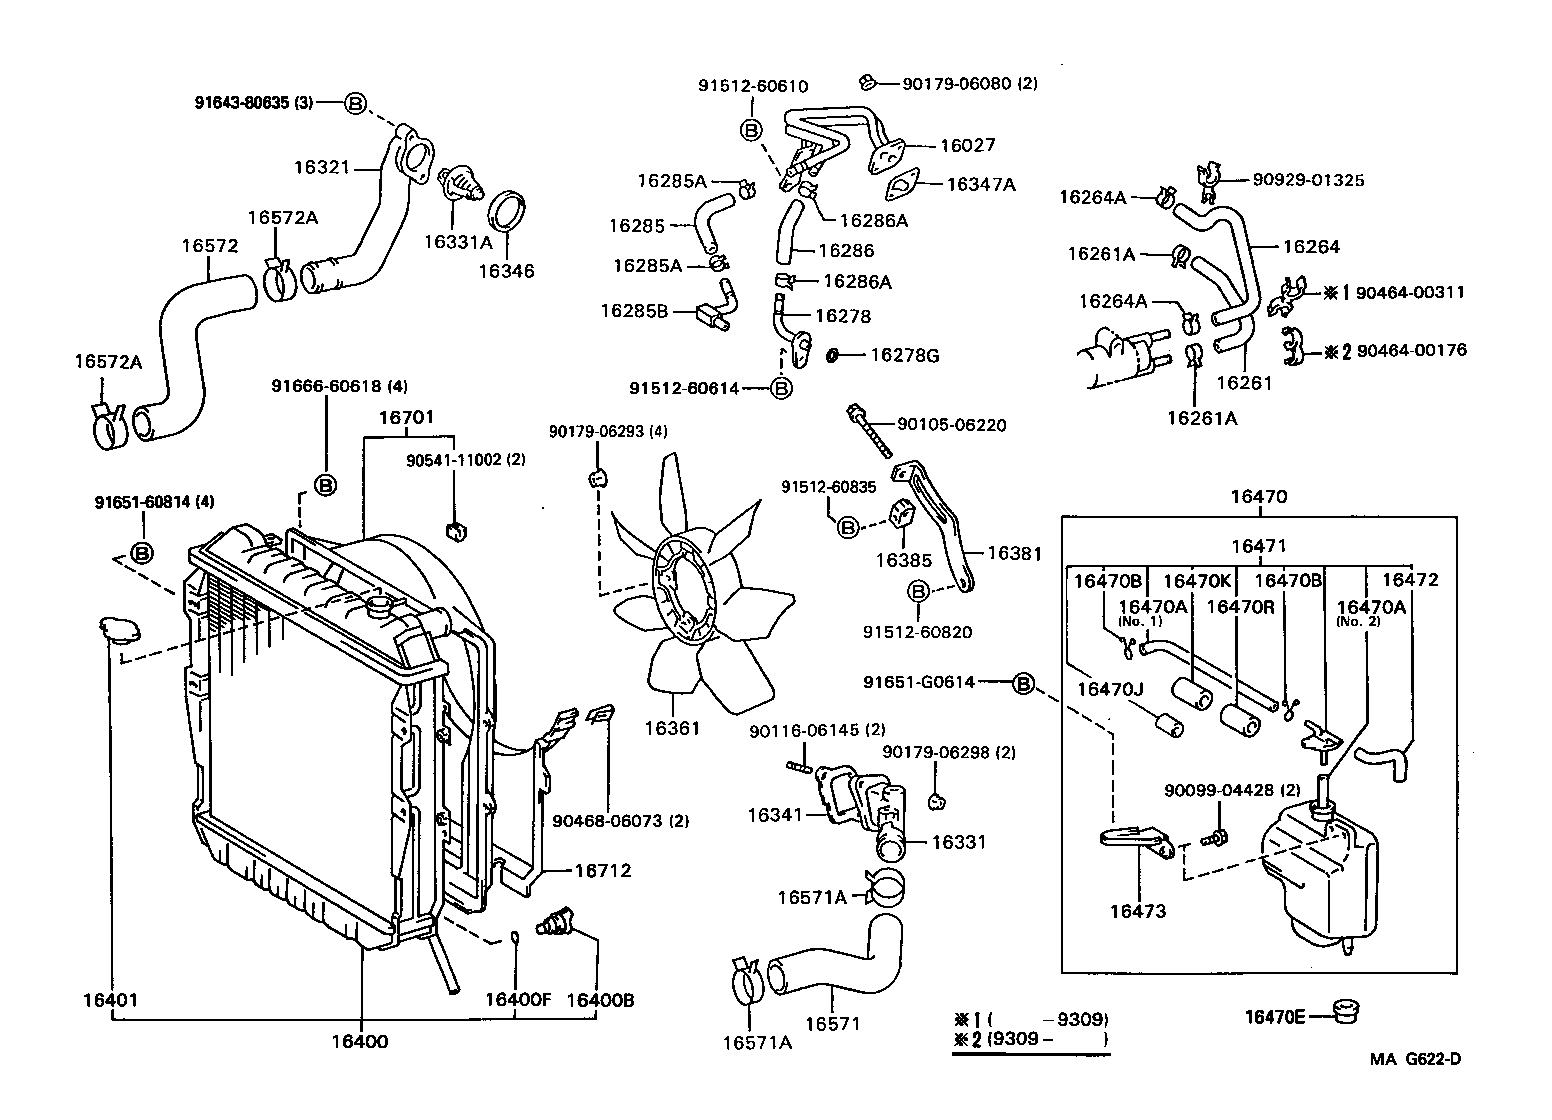 1995 toyota tercel engine diagram nissan maxima wiring repair manual imageresizertool com